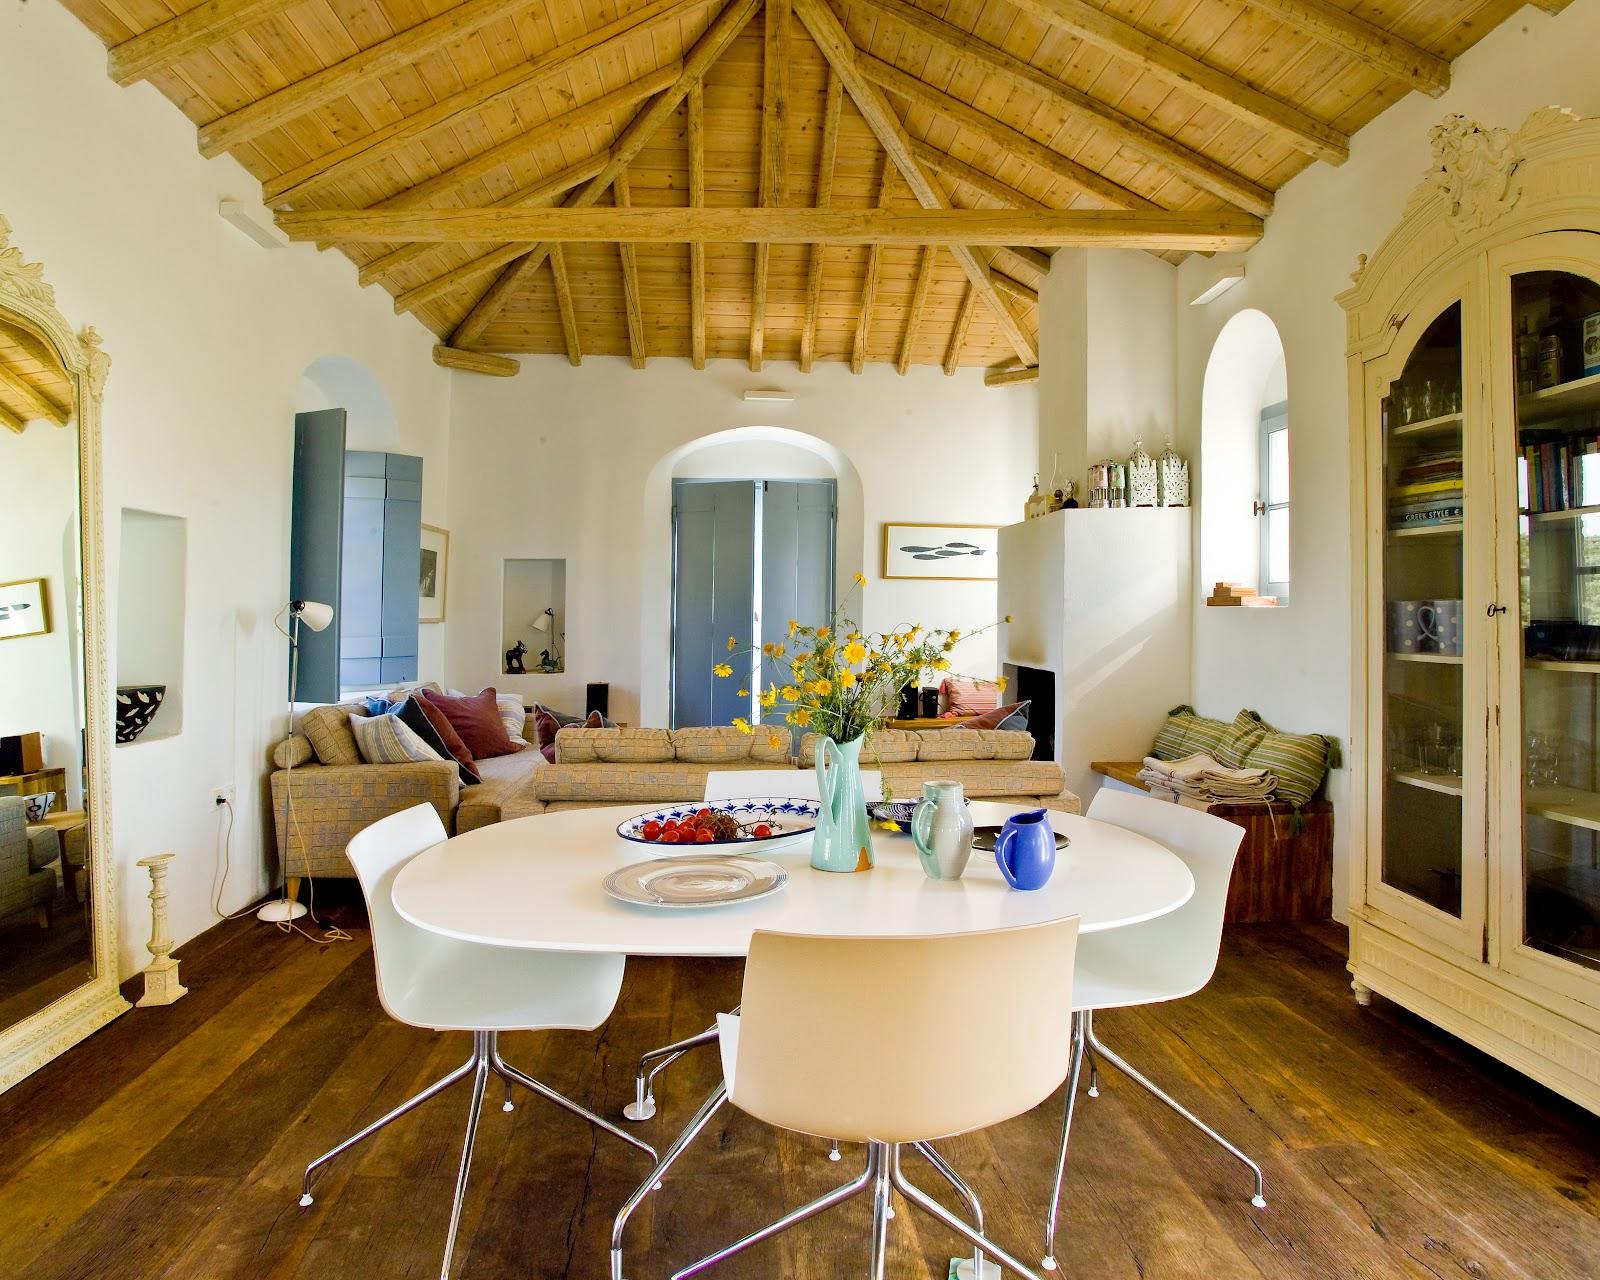 greek_island_style_interior_design1.jpg